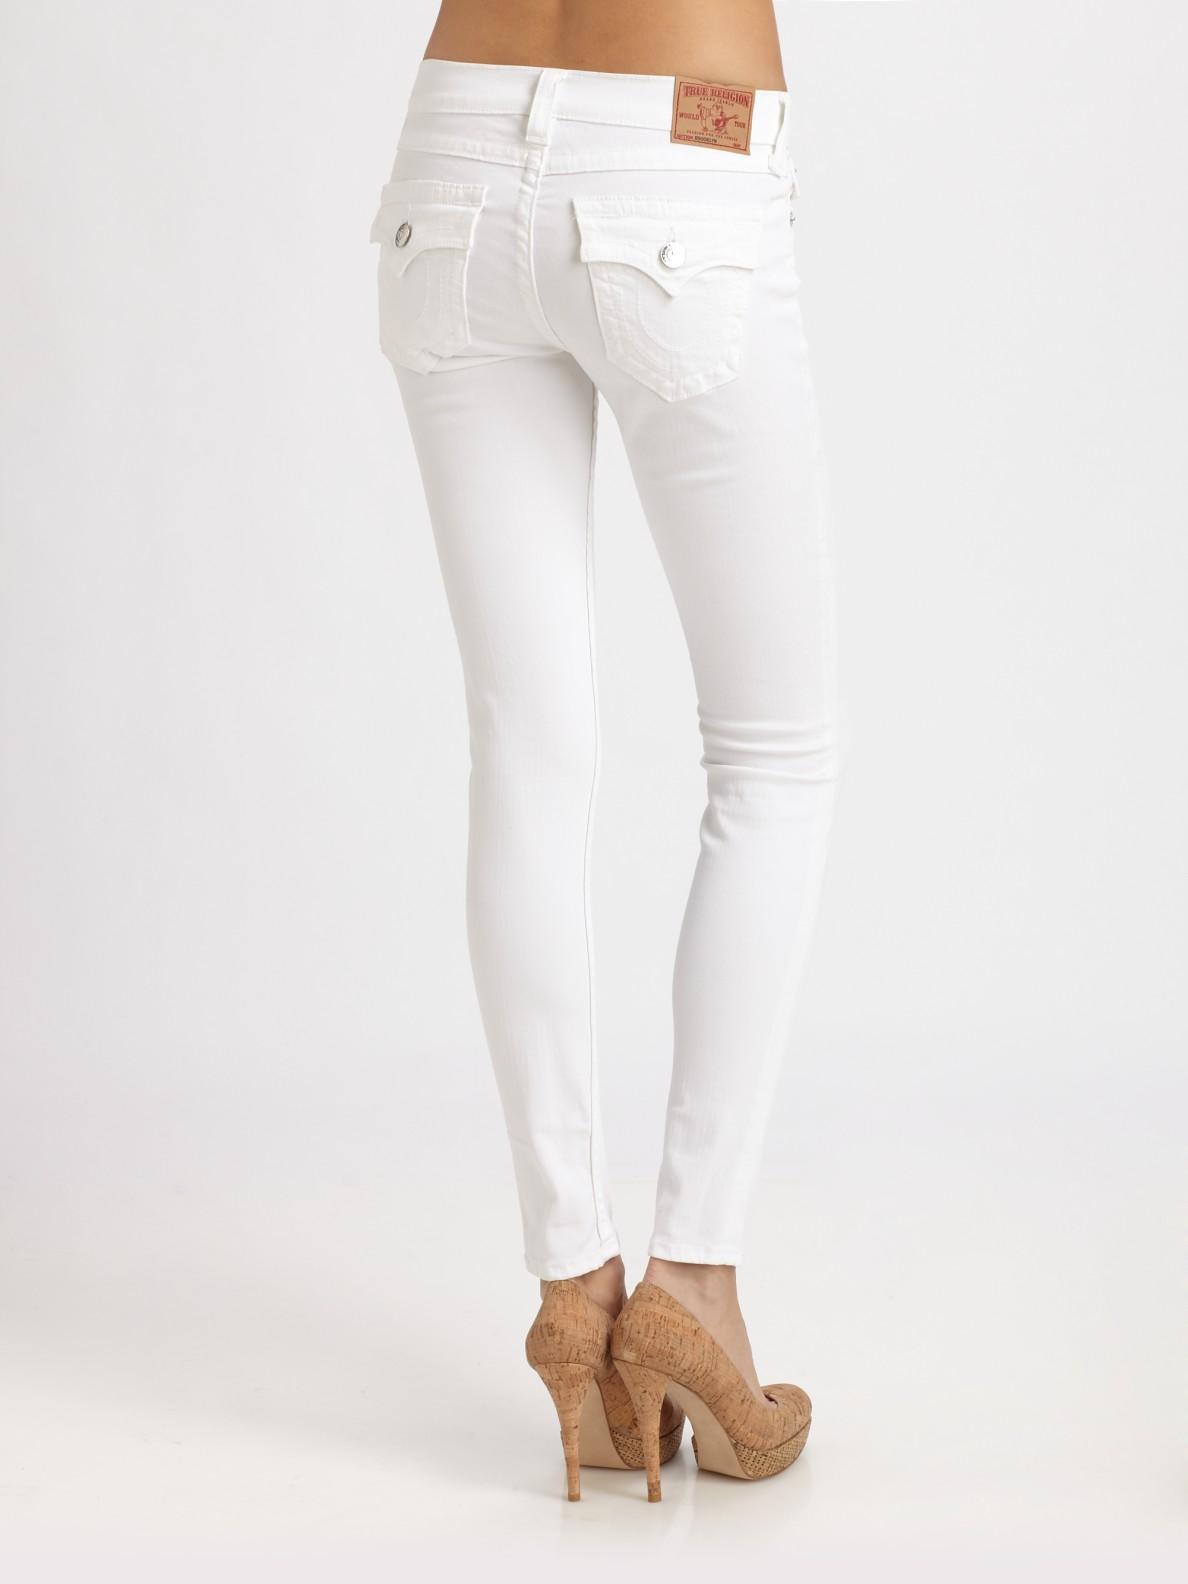 True religion Serena Skinny Leg Jeans in White | Lyst